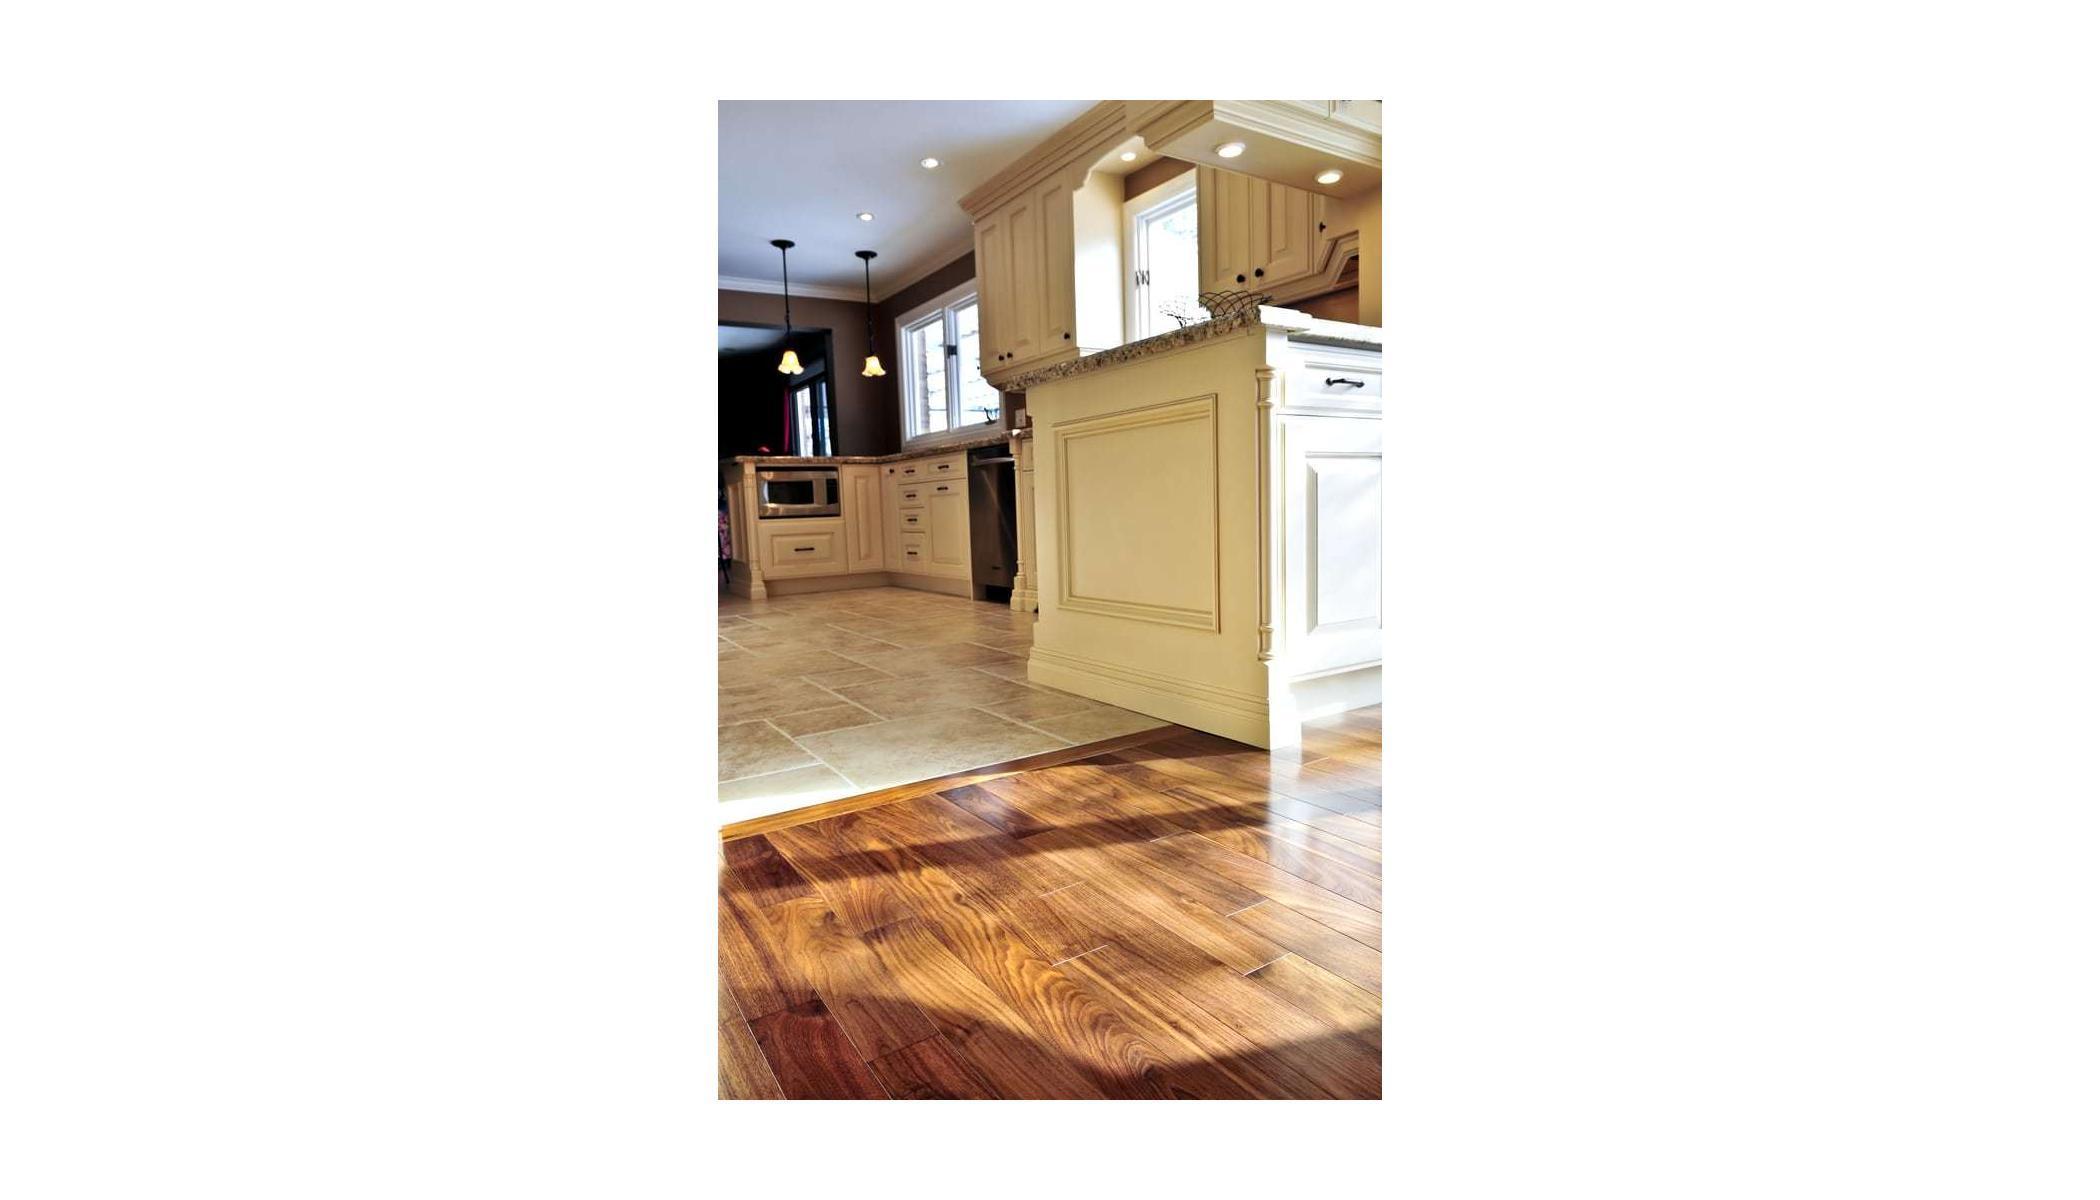 Tile Vs Hardwood Floors What Should You Choose